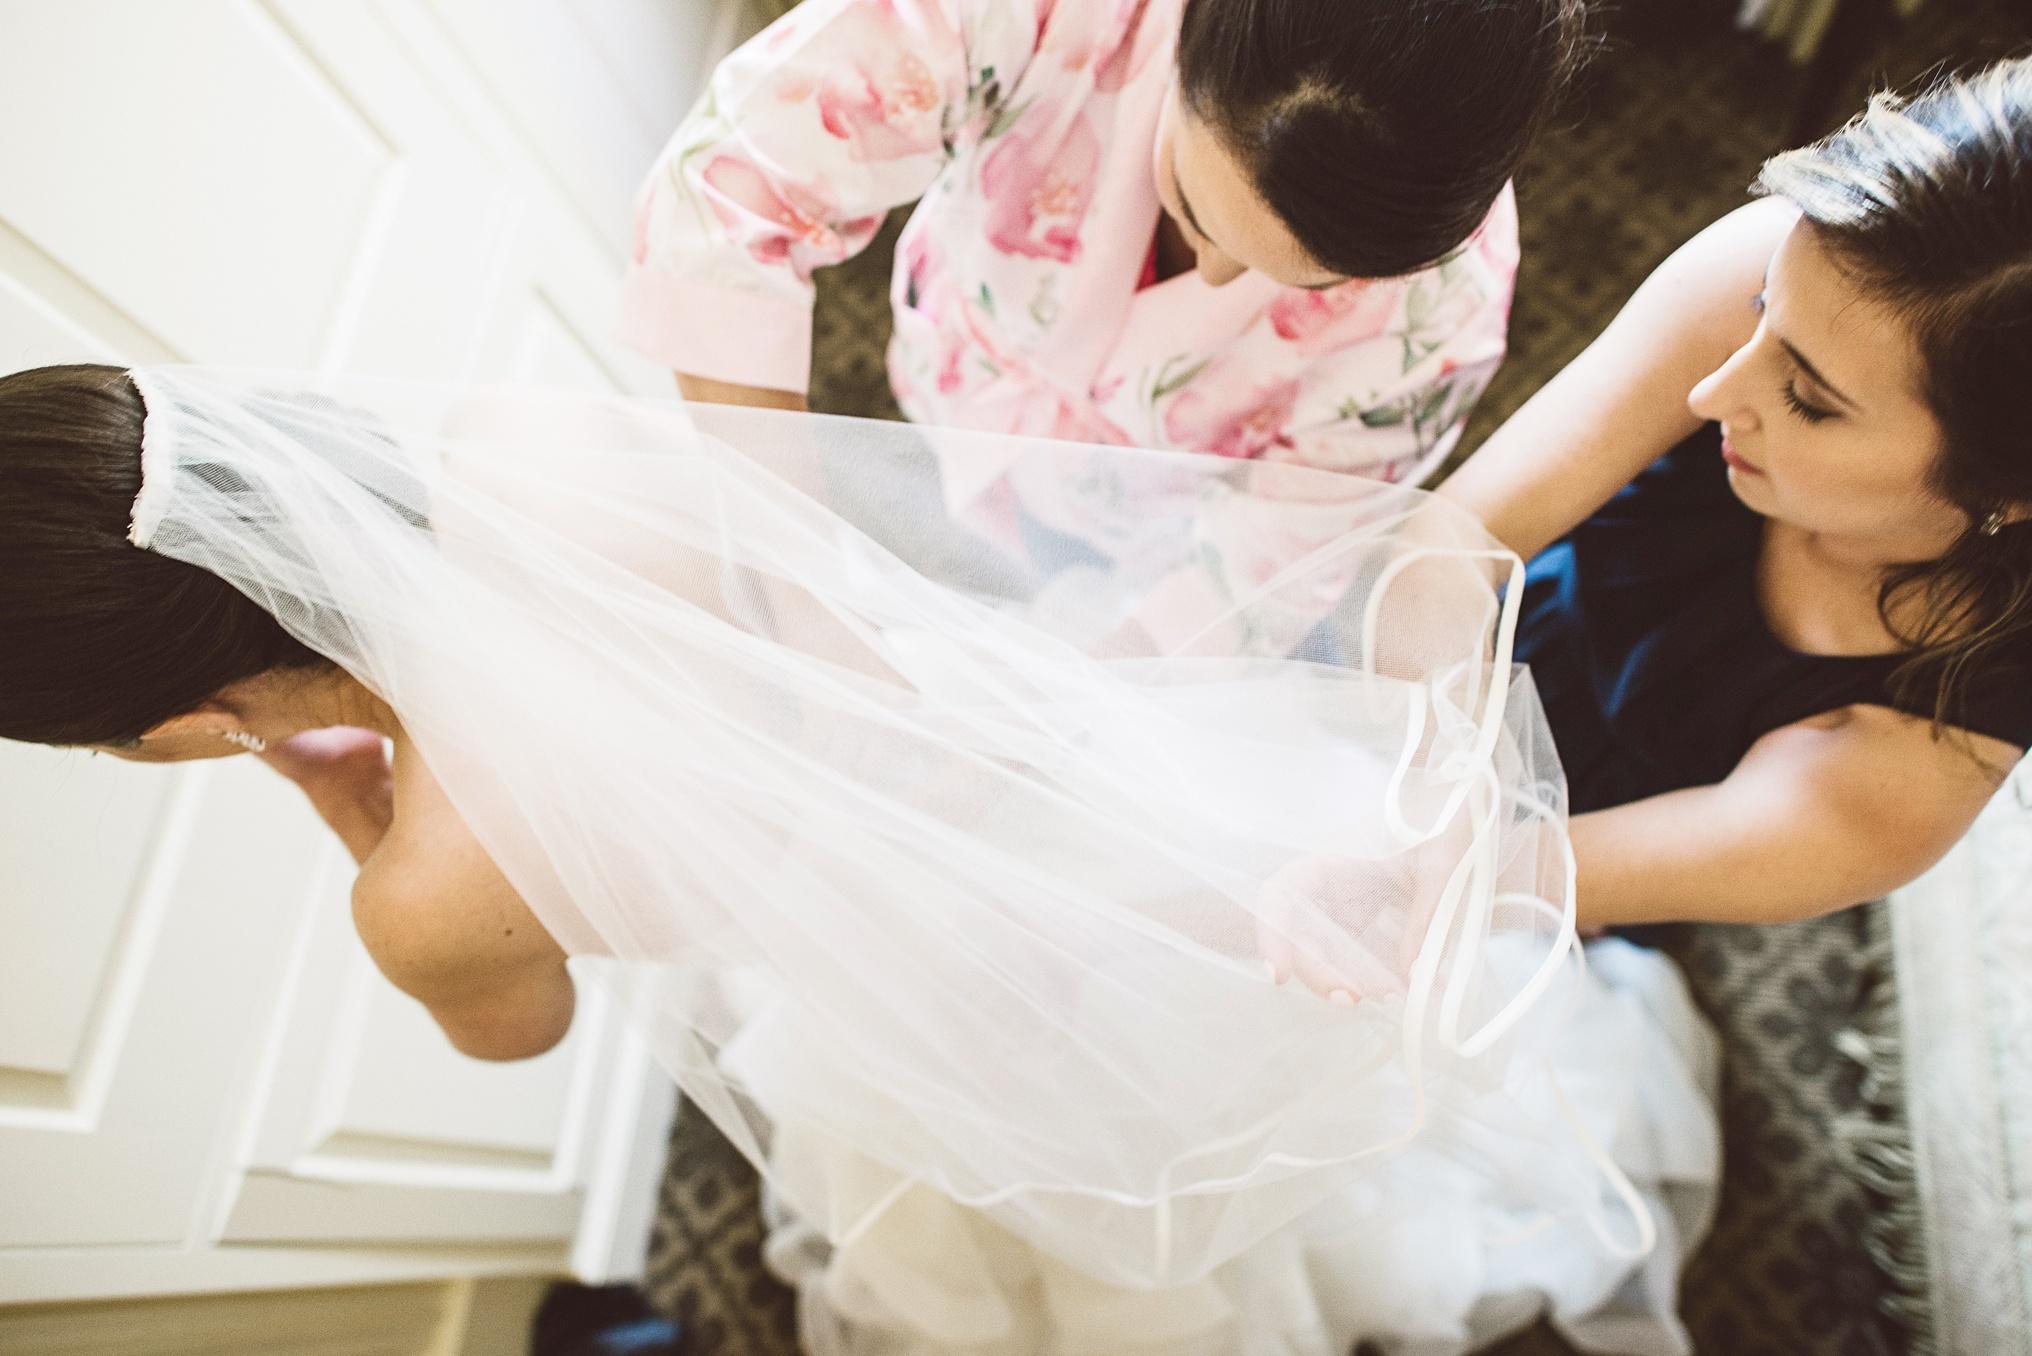 best_wedding_photography_2017_by_lucas_botz_photography_217.jpg